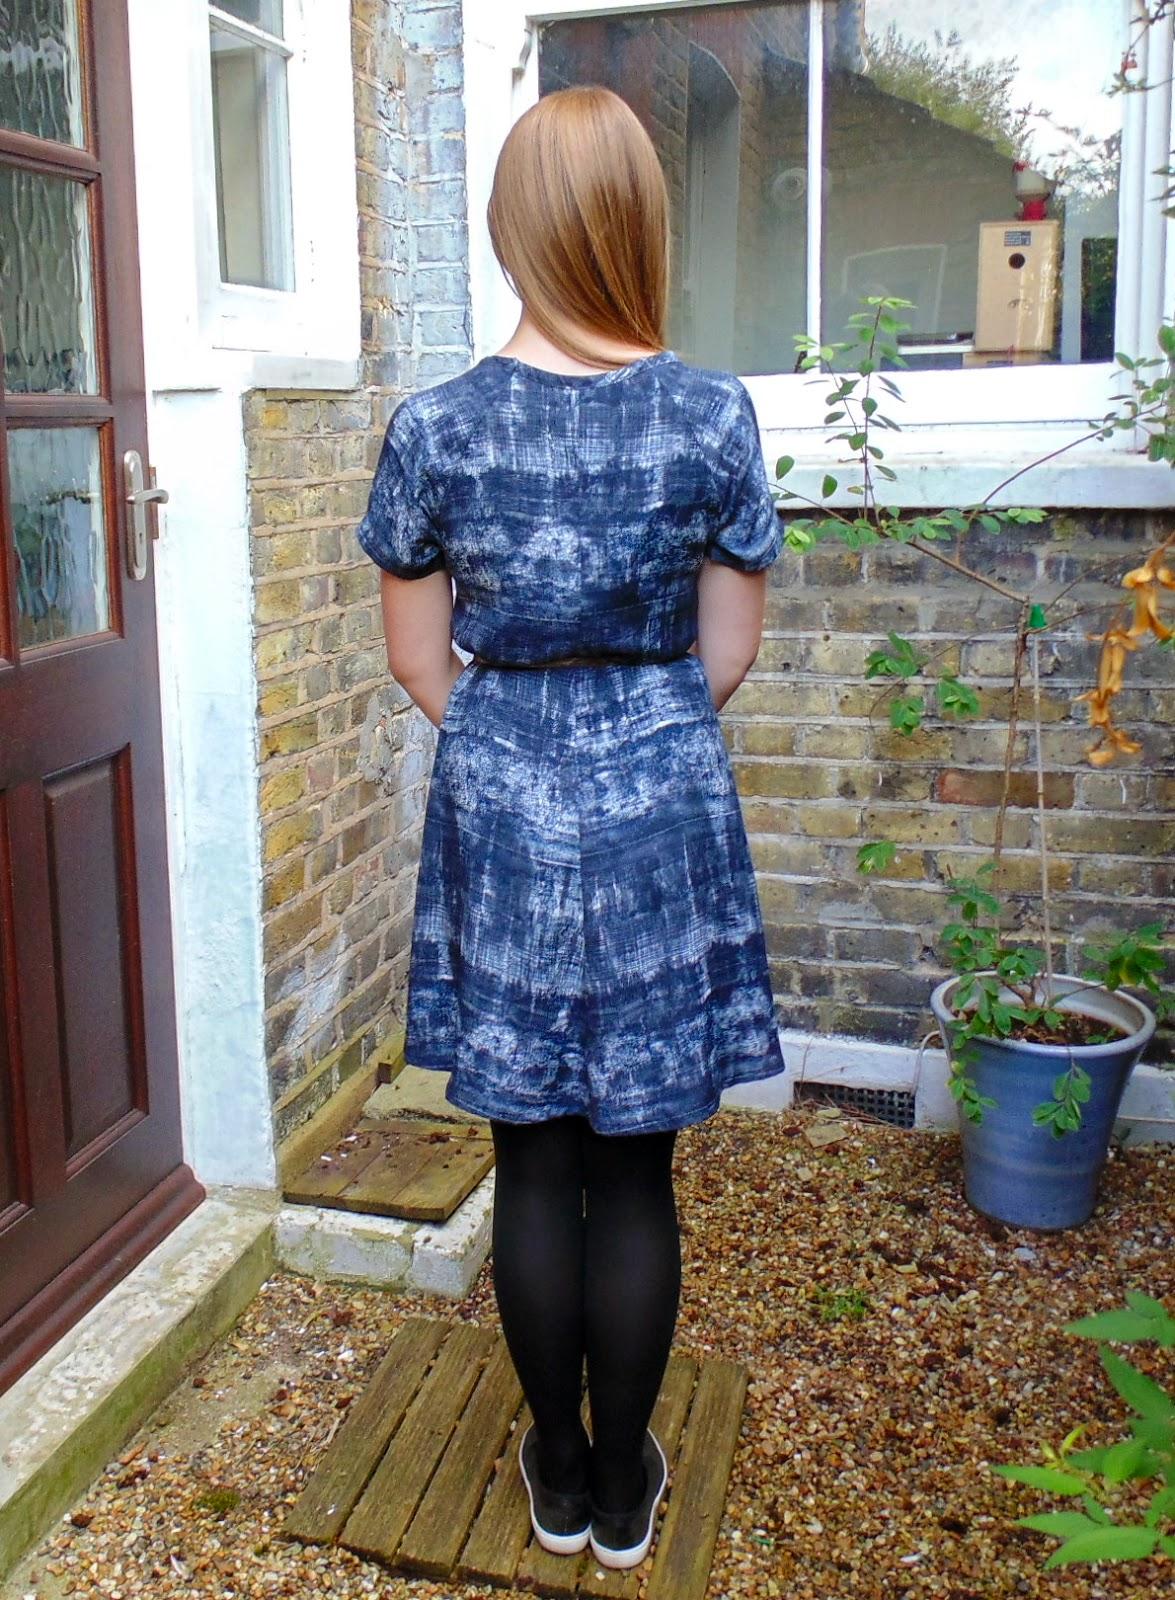 Diary of a Chain Stitcher: Papercut Patterns Clover Dress in a Monochrome Printed Viscose